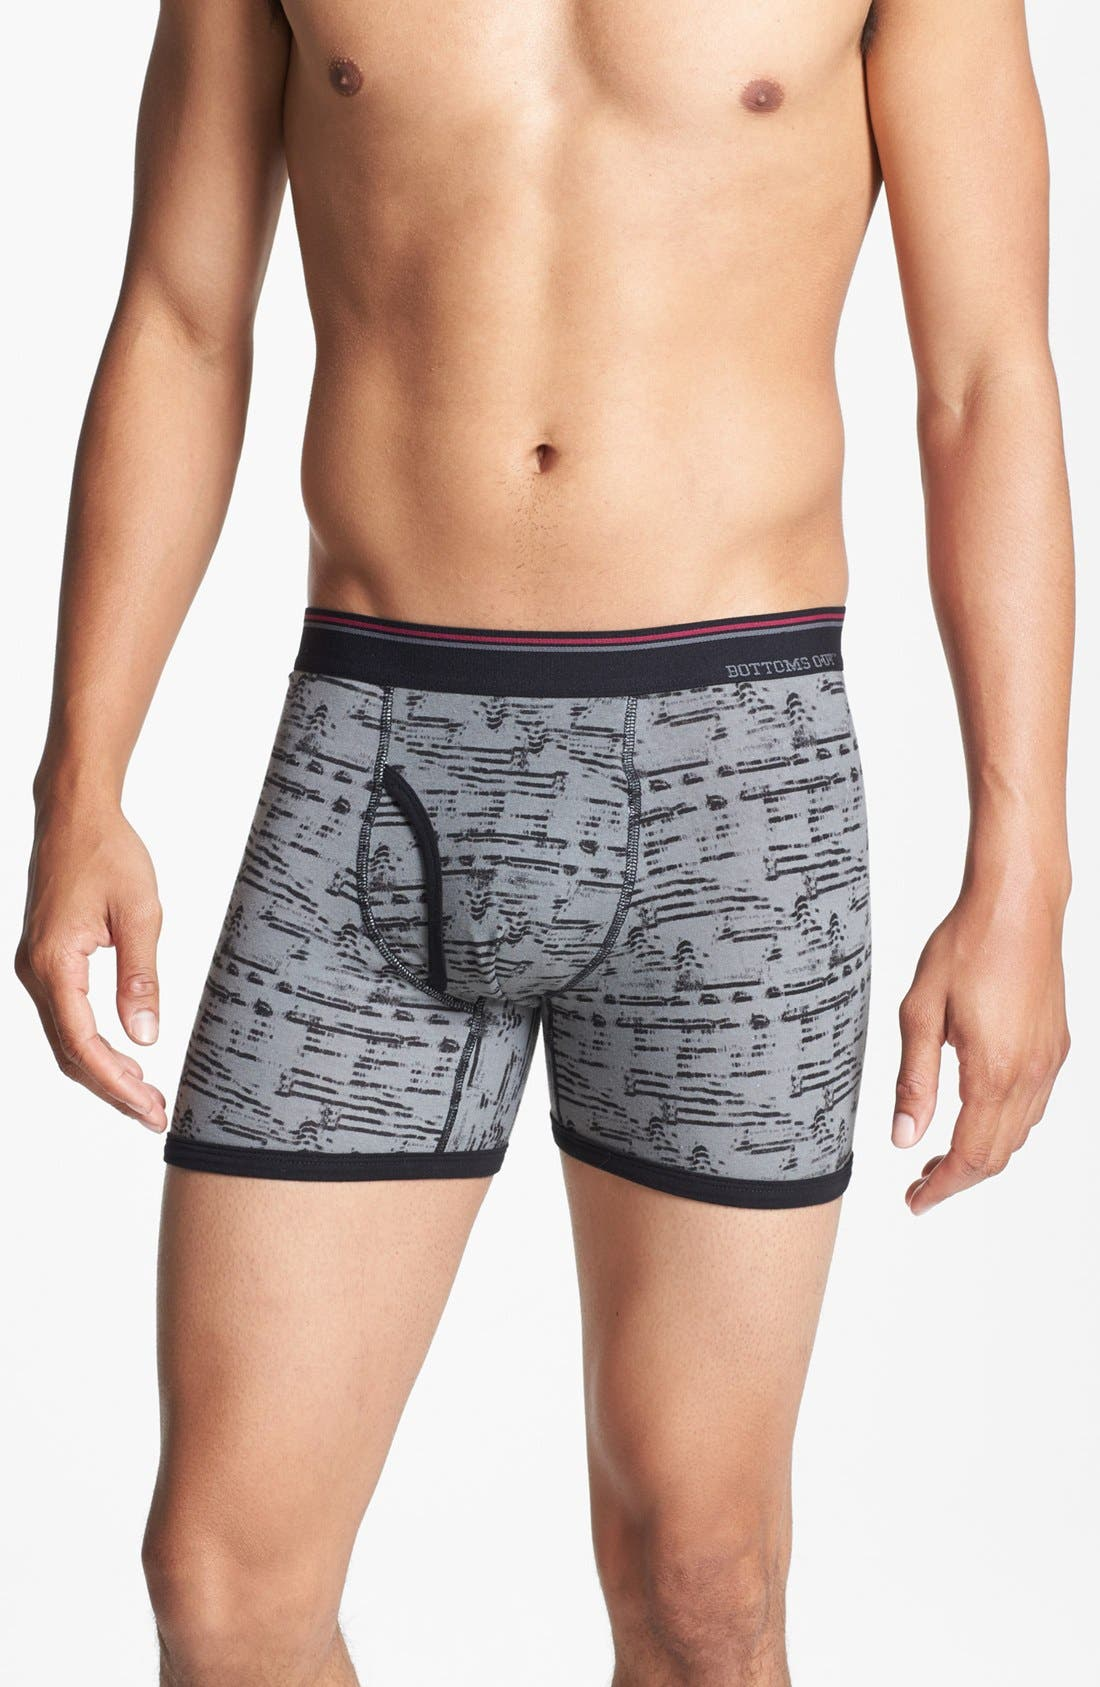 Alternate Image 2  - Basic Underwear 'Bottoms Out' Boxer Briefs (3-Pack)